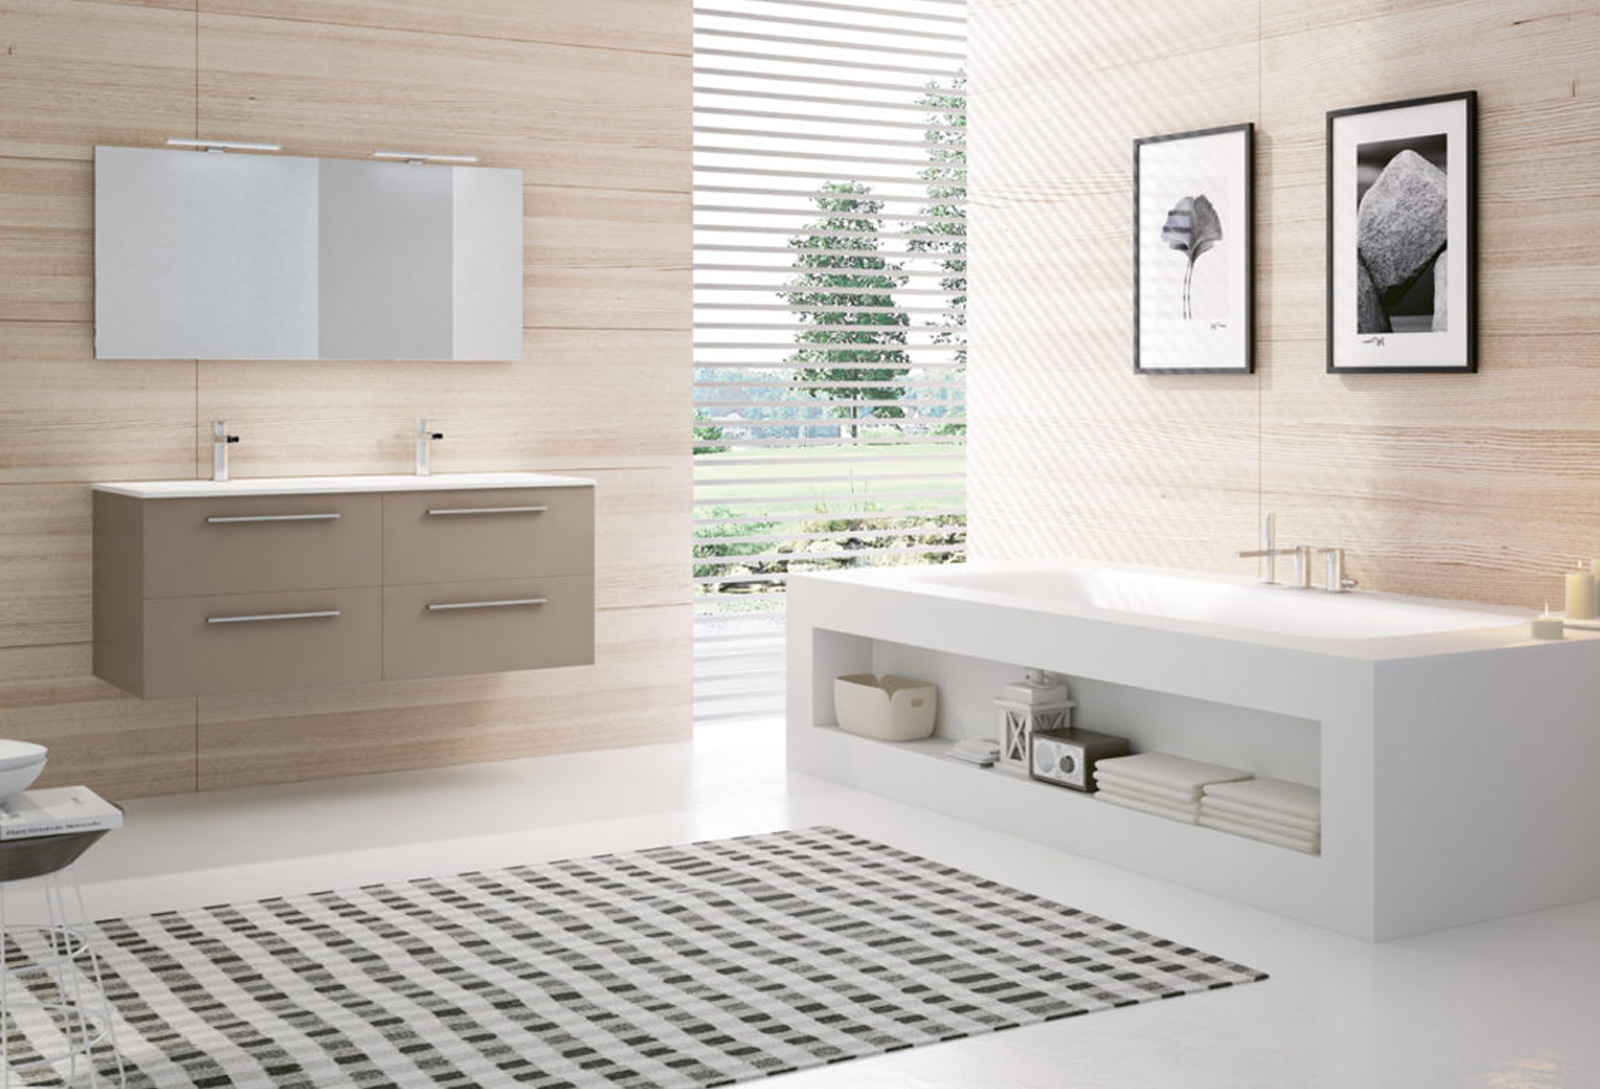 Bmt italian custom bathroom